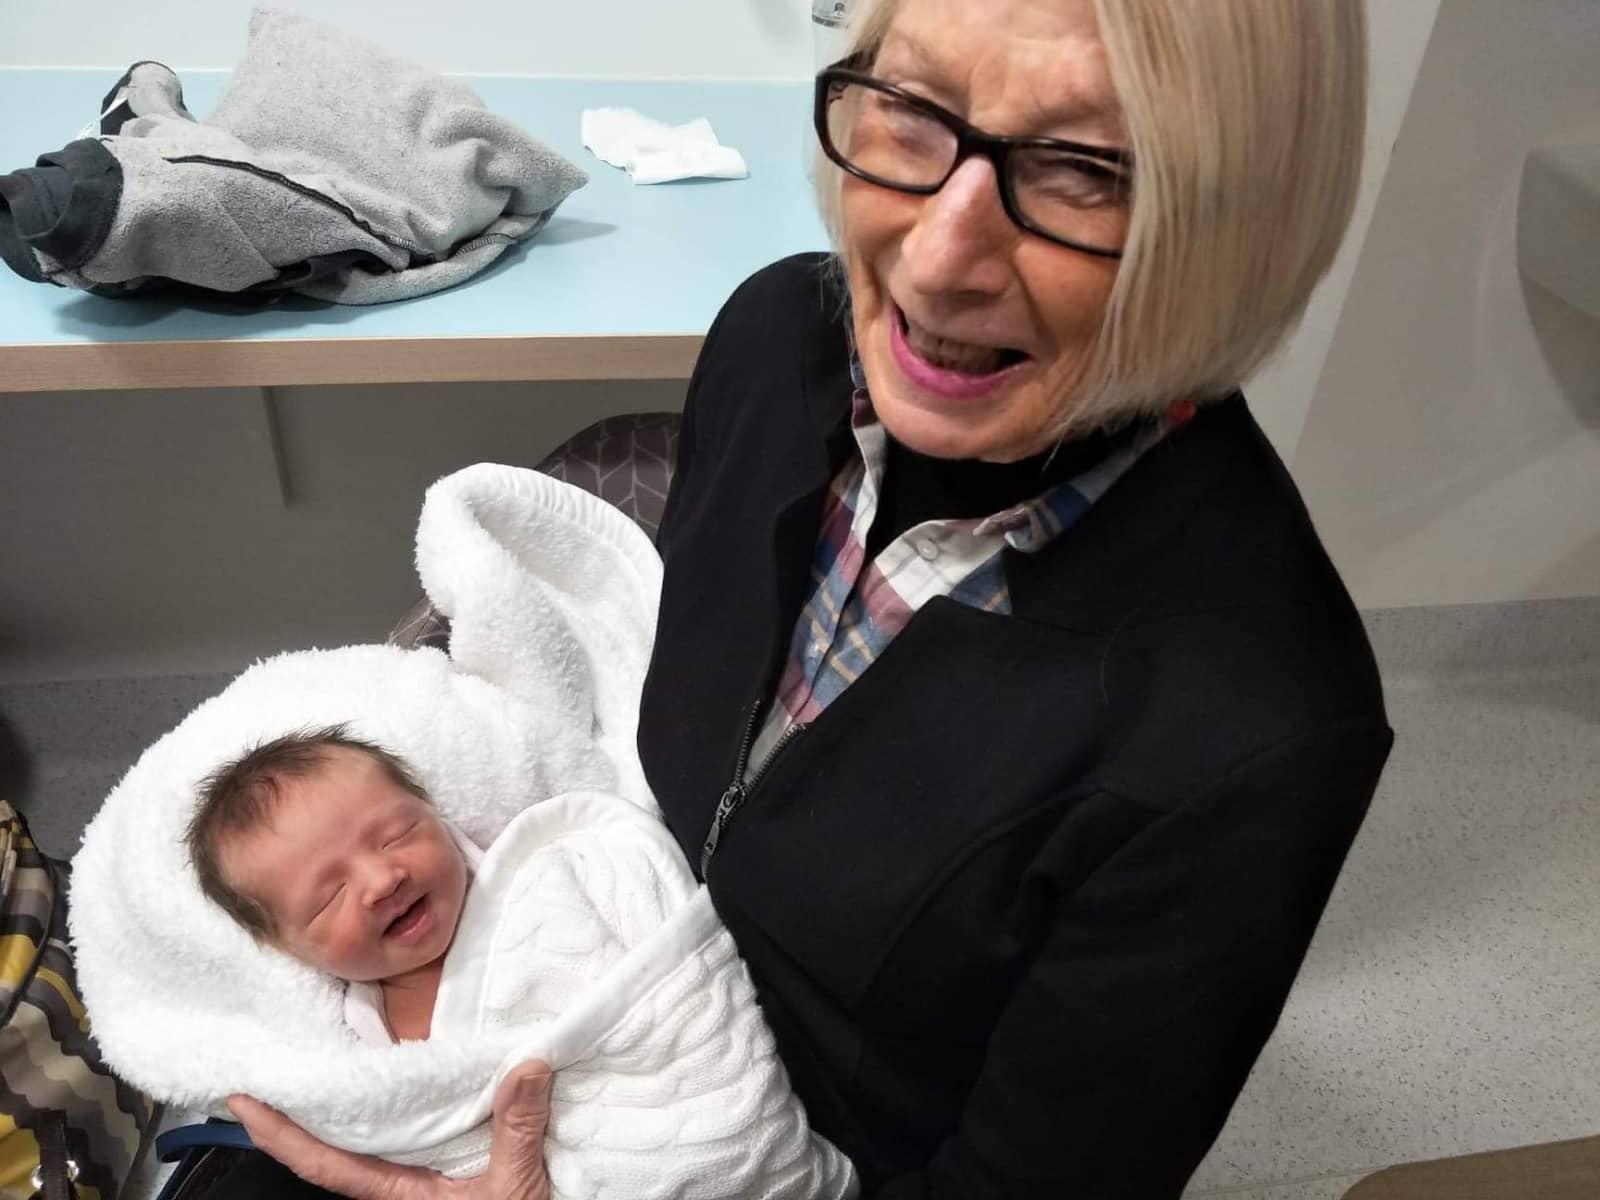 Elizabeth & Martin from East Toowoomba, Queensland, Australia